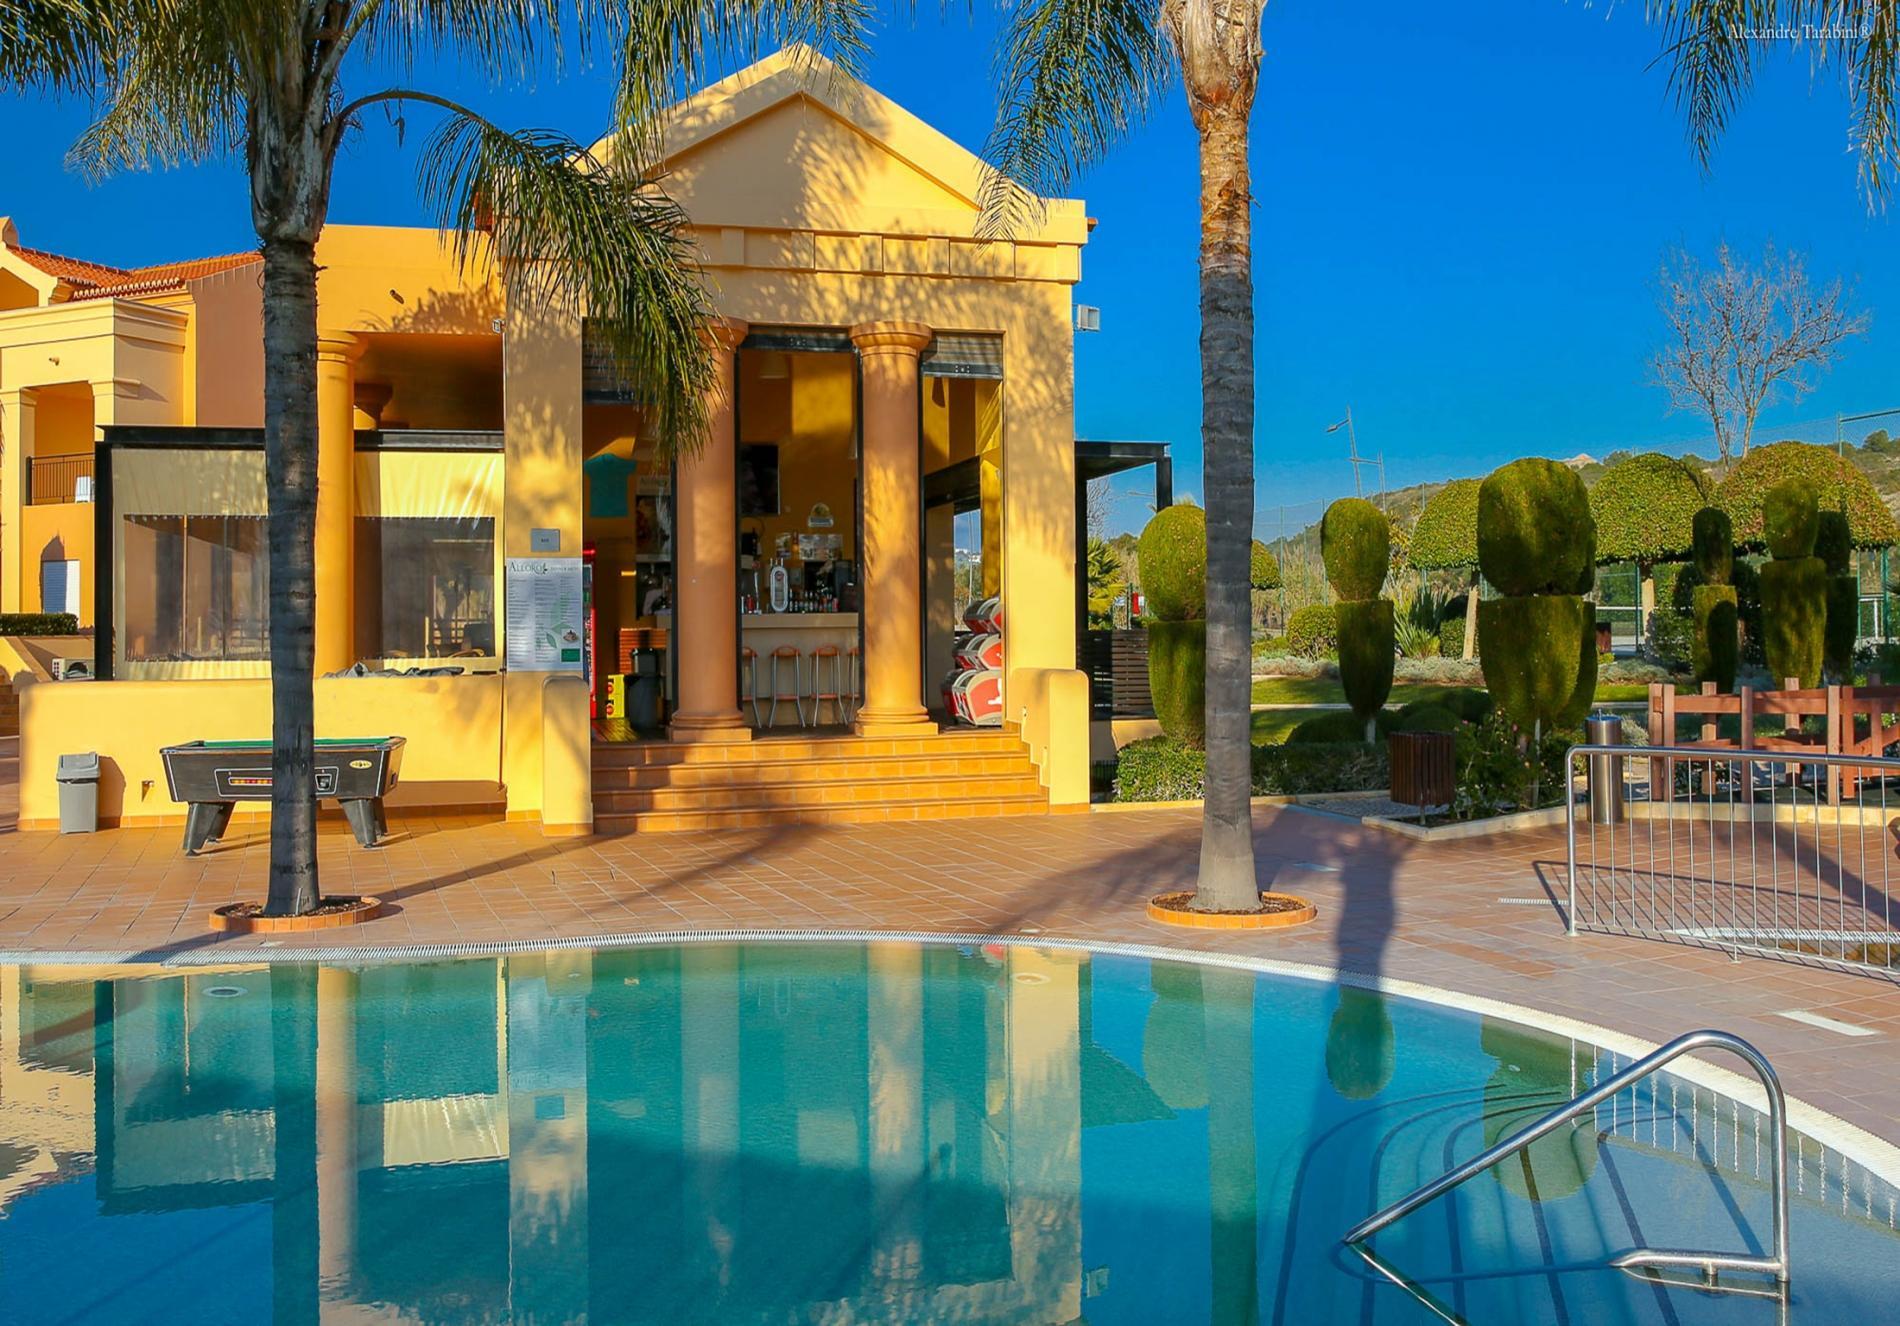 Ferienwohnung A24 - LuzBay Beach Apartment (2558091), Luz, , Algarve, Portugal, Bild 33